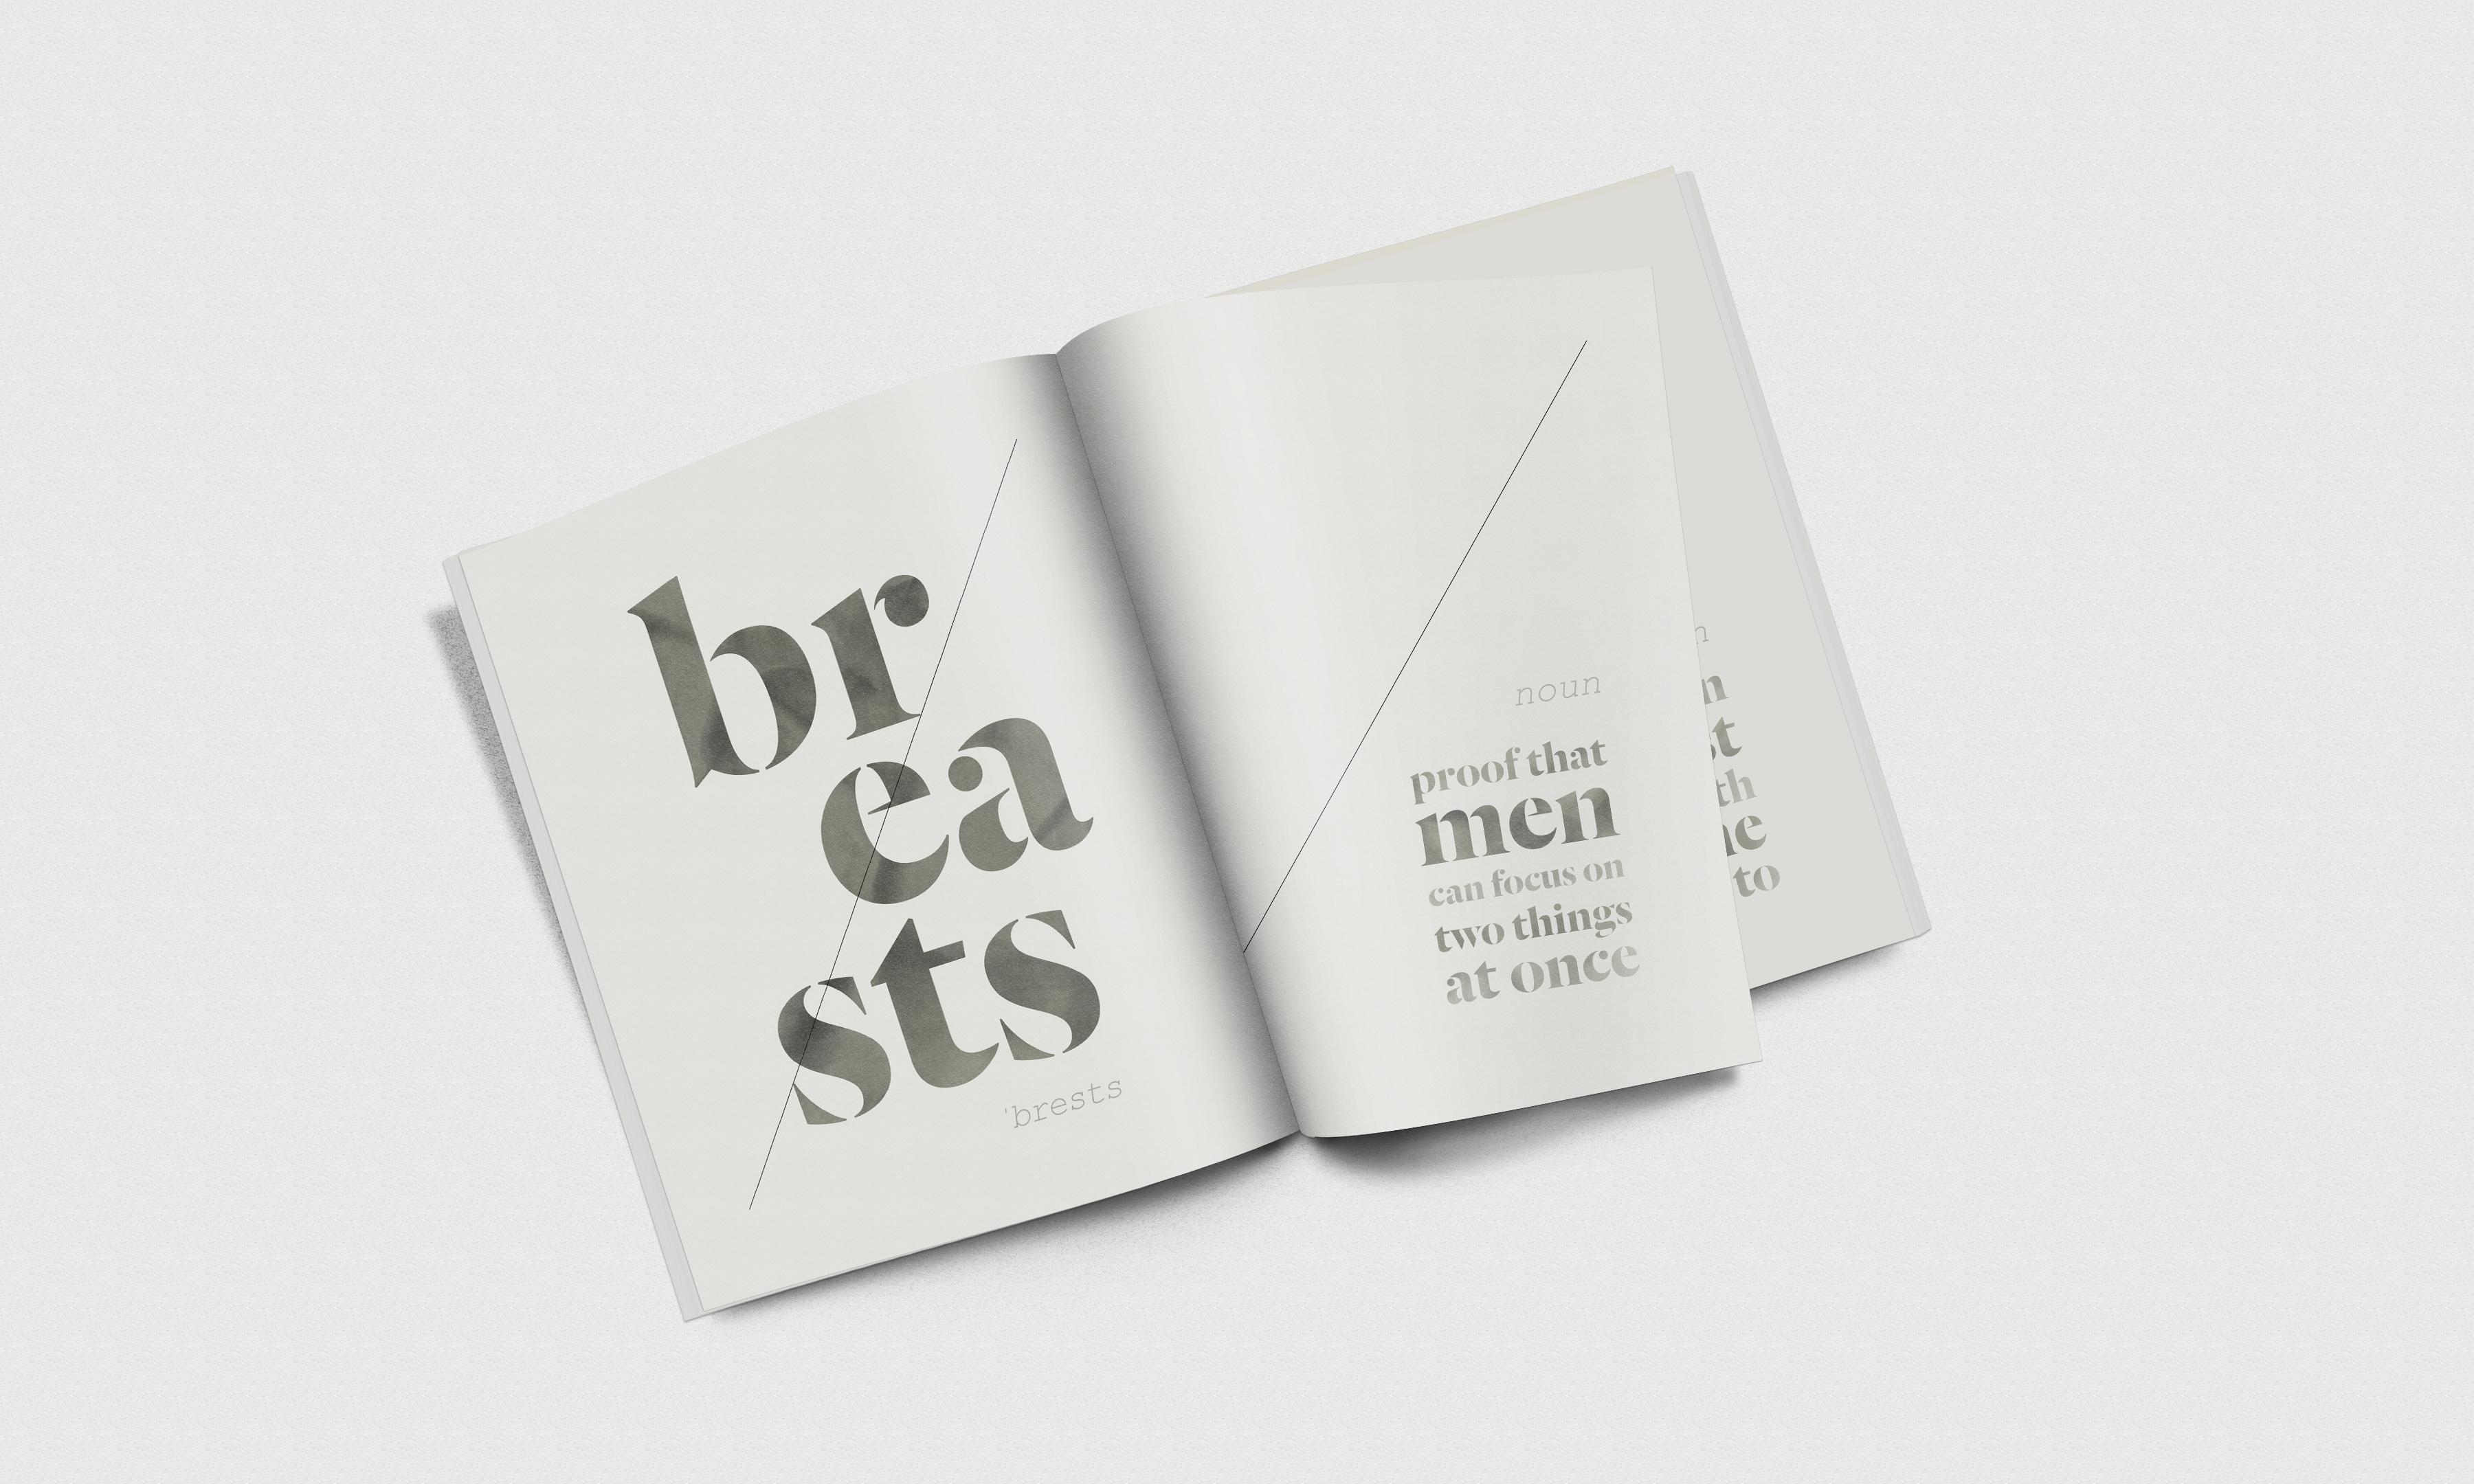 Magazine breasts stone noun2